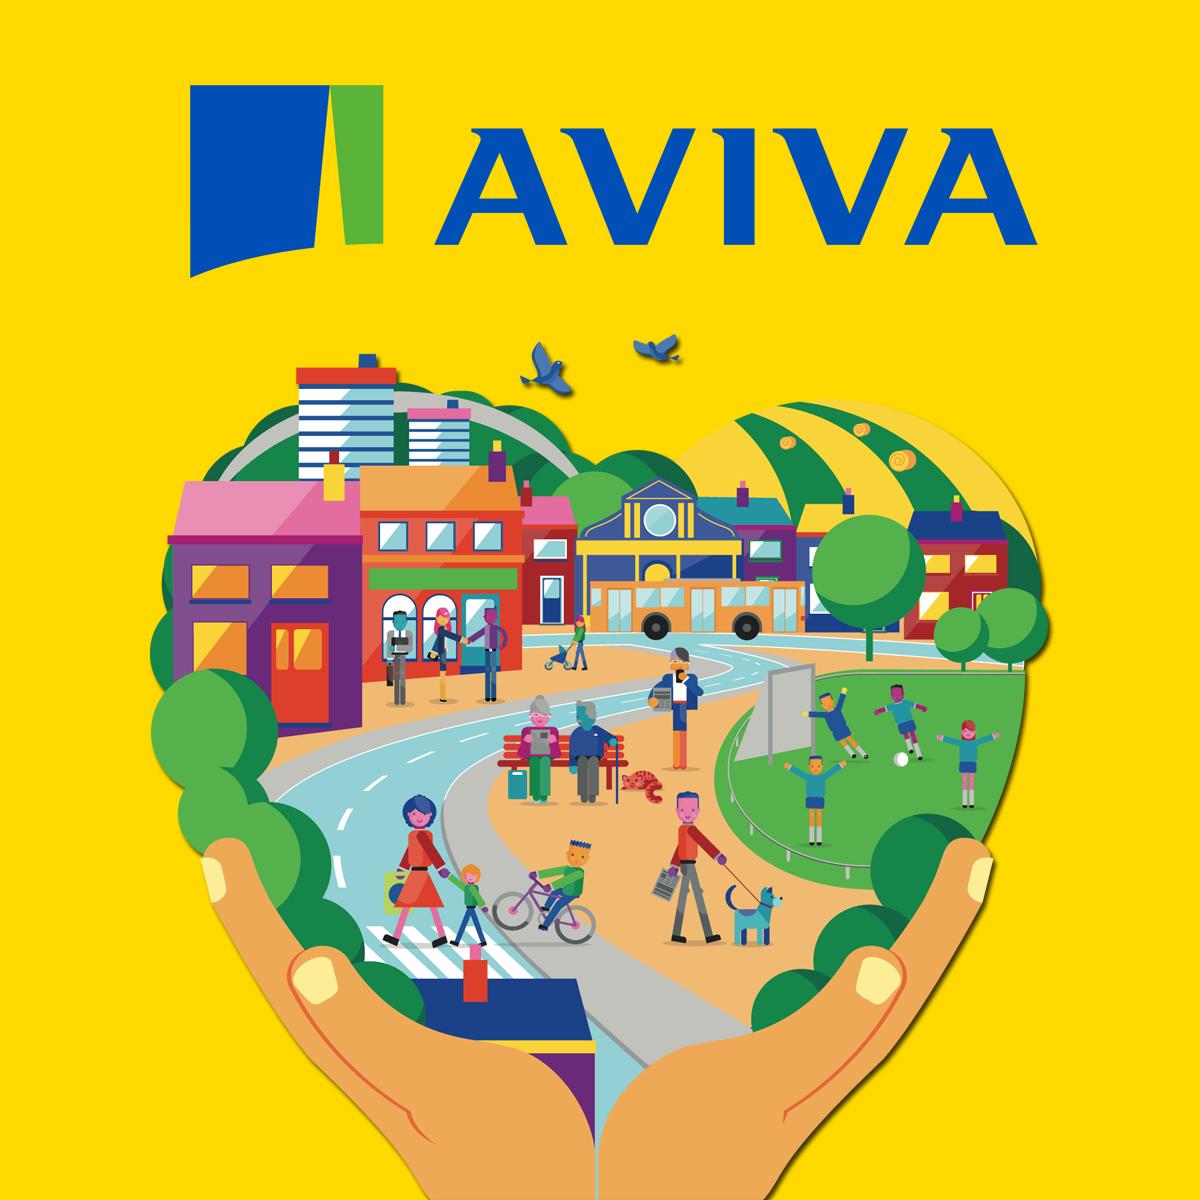 https://www.promotionmagazine.it/wp/wp-content/uploads/2017/05/Aviva-Community-Fund_IMMAGINE-NON-MODIFICABILE.jpg